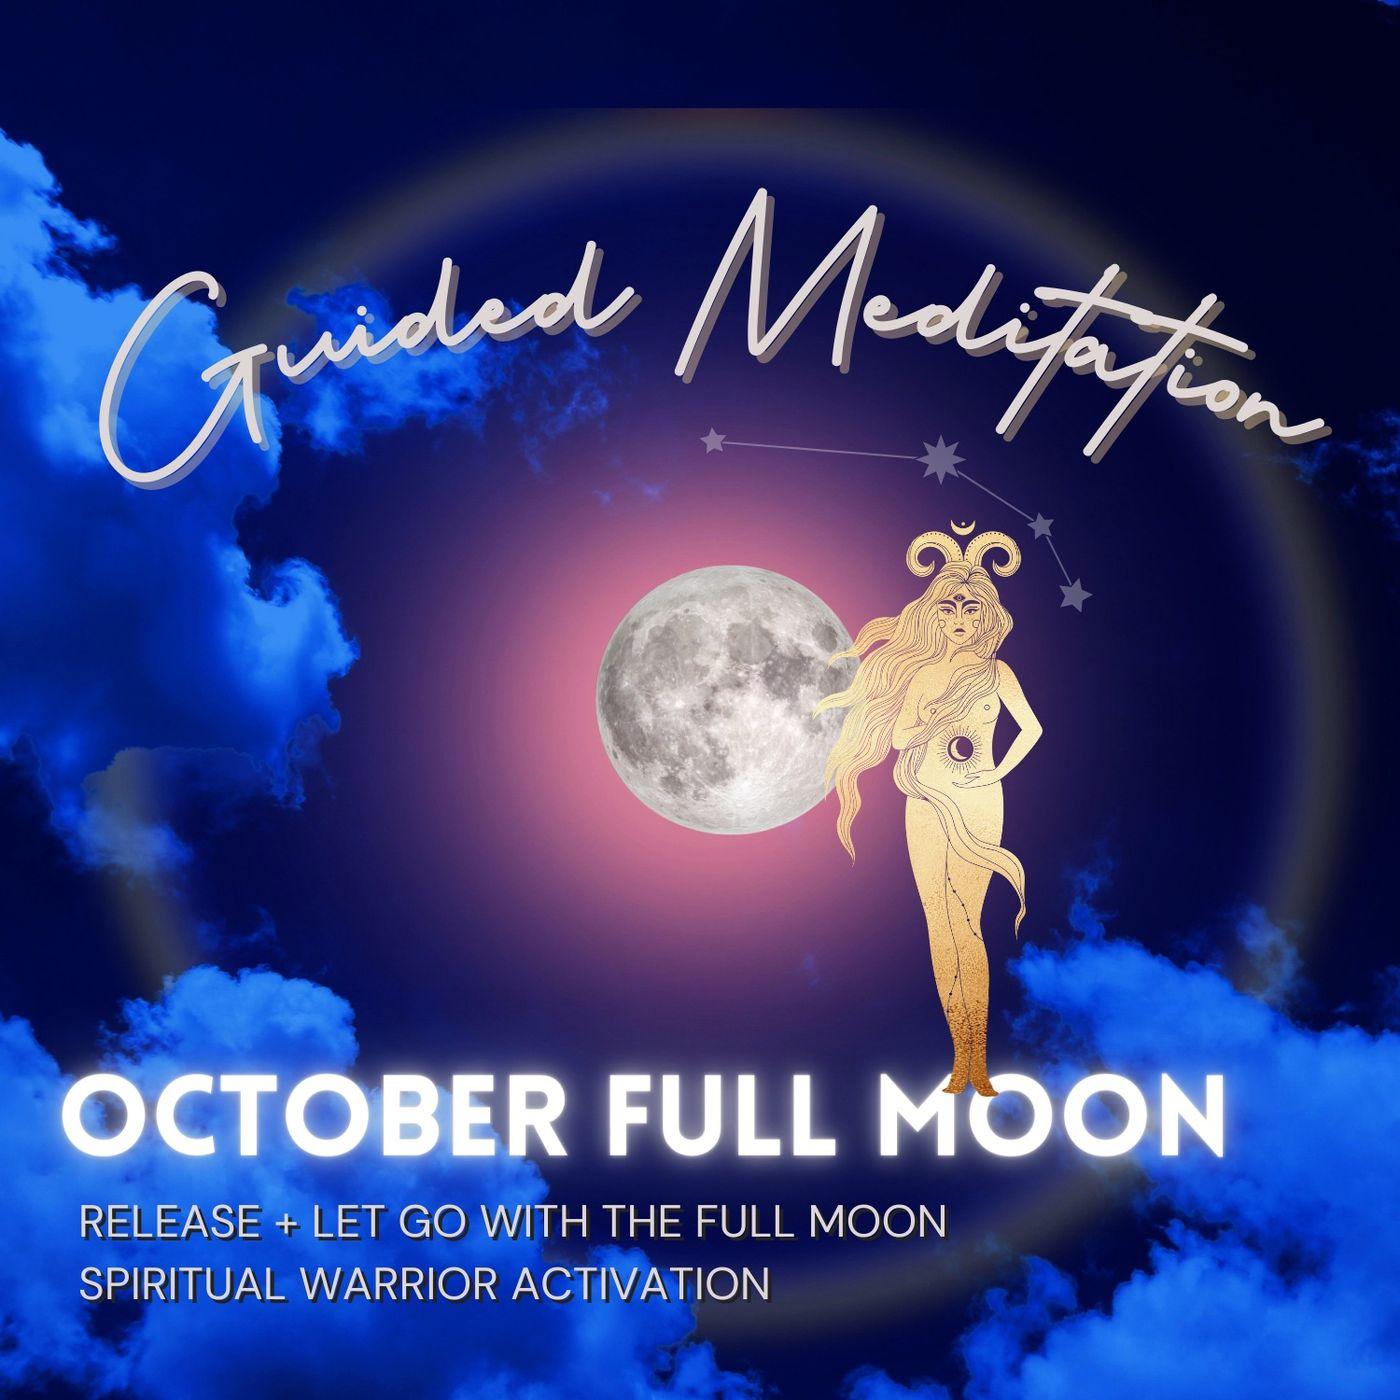 October Full Moon in Aries Guided Meditation